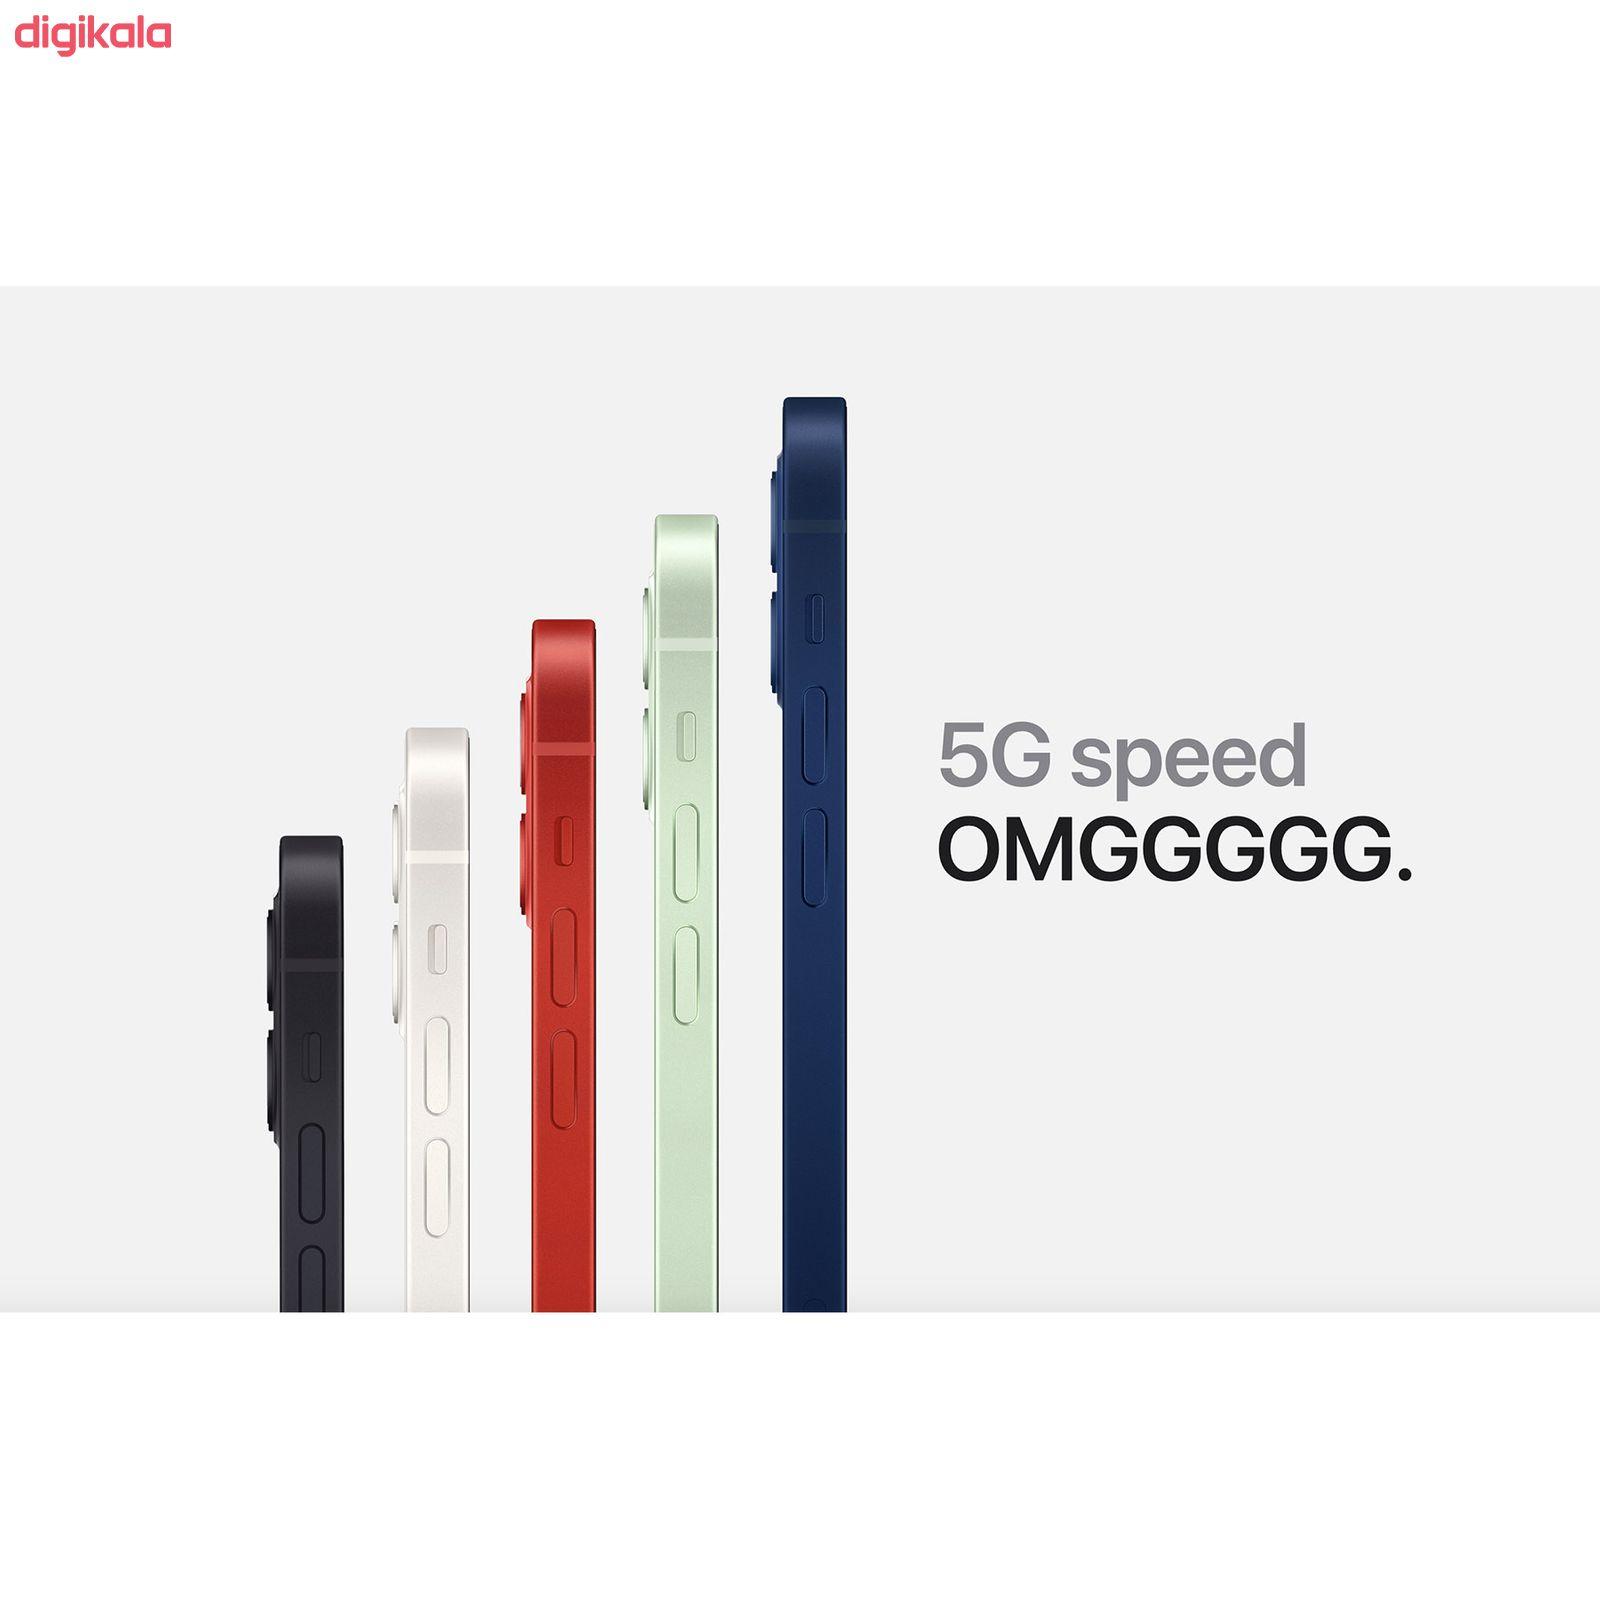 گوشی موبایل اپل مدل iPhone 12 A2404 دو سیم کارت ظرفیت 128 گیگابایت  main 1 6